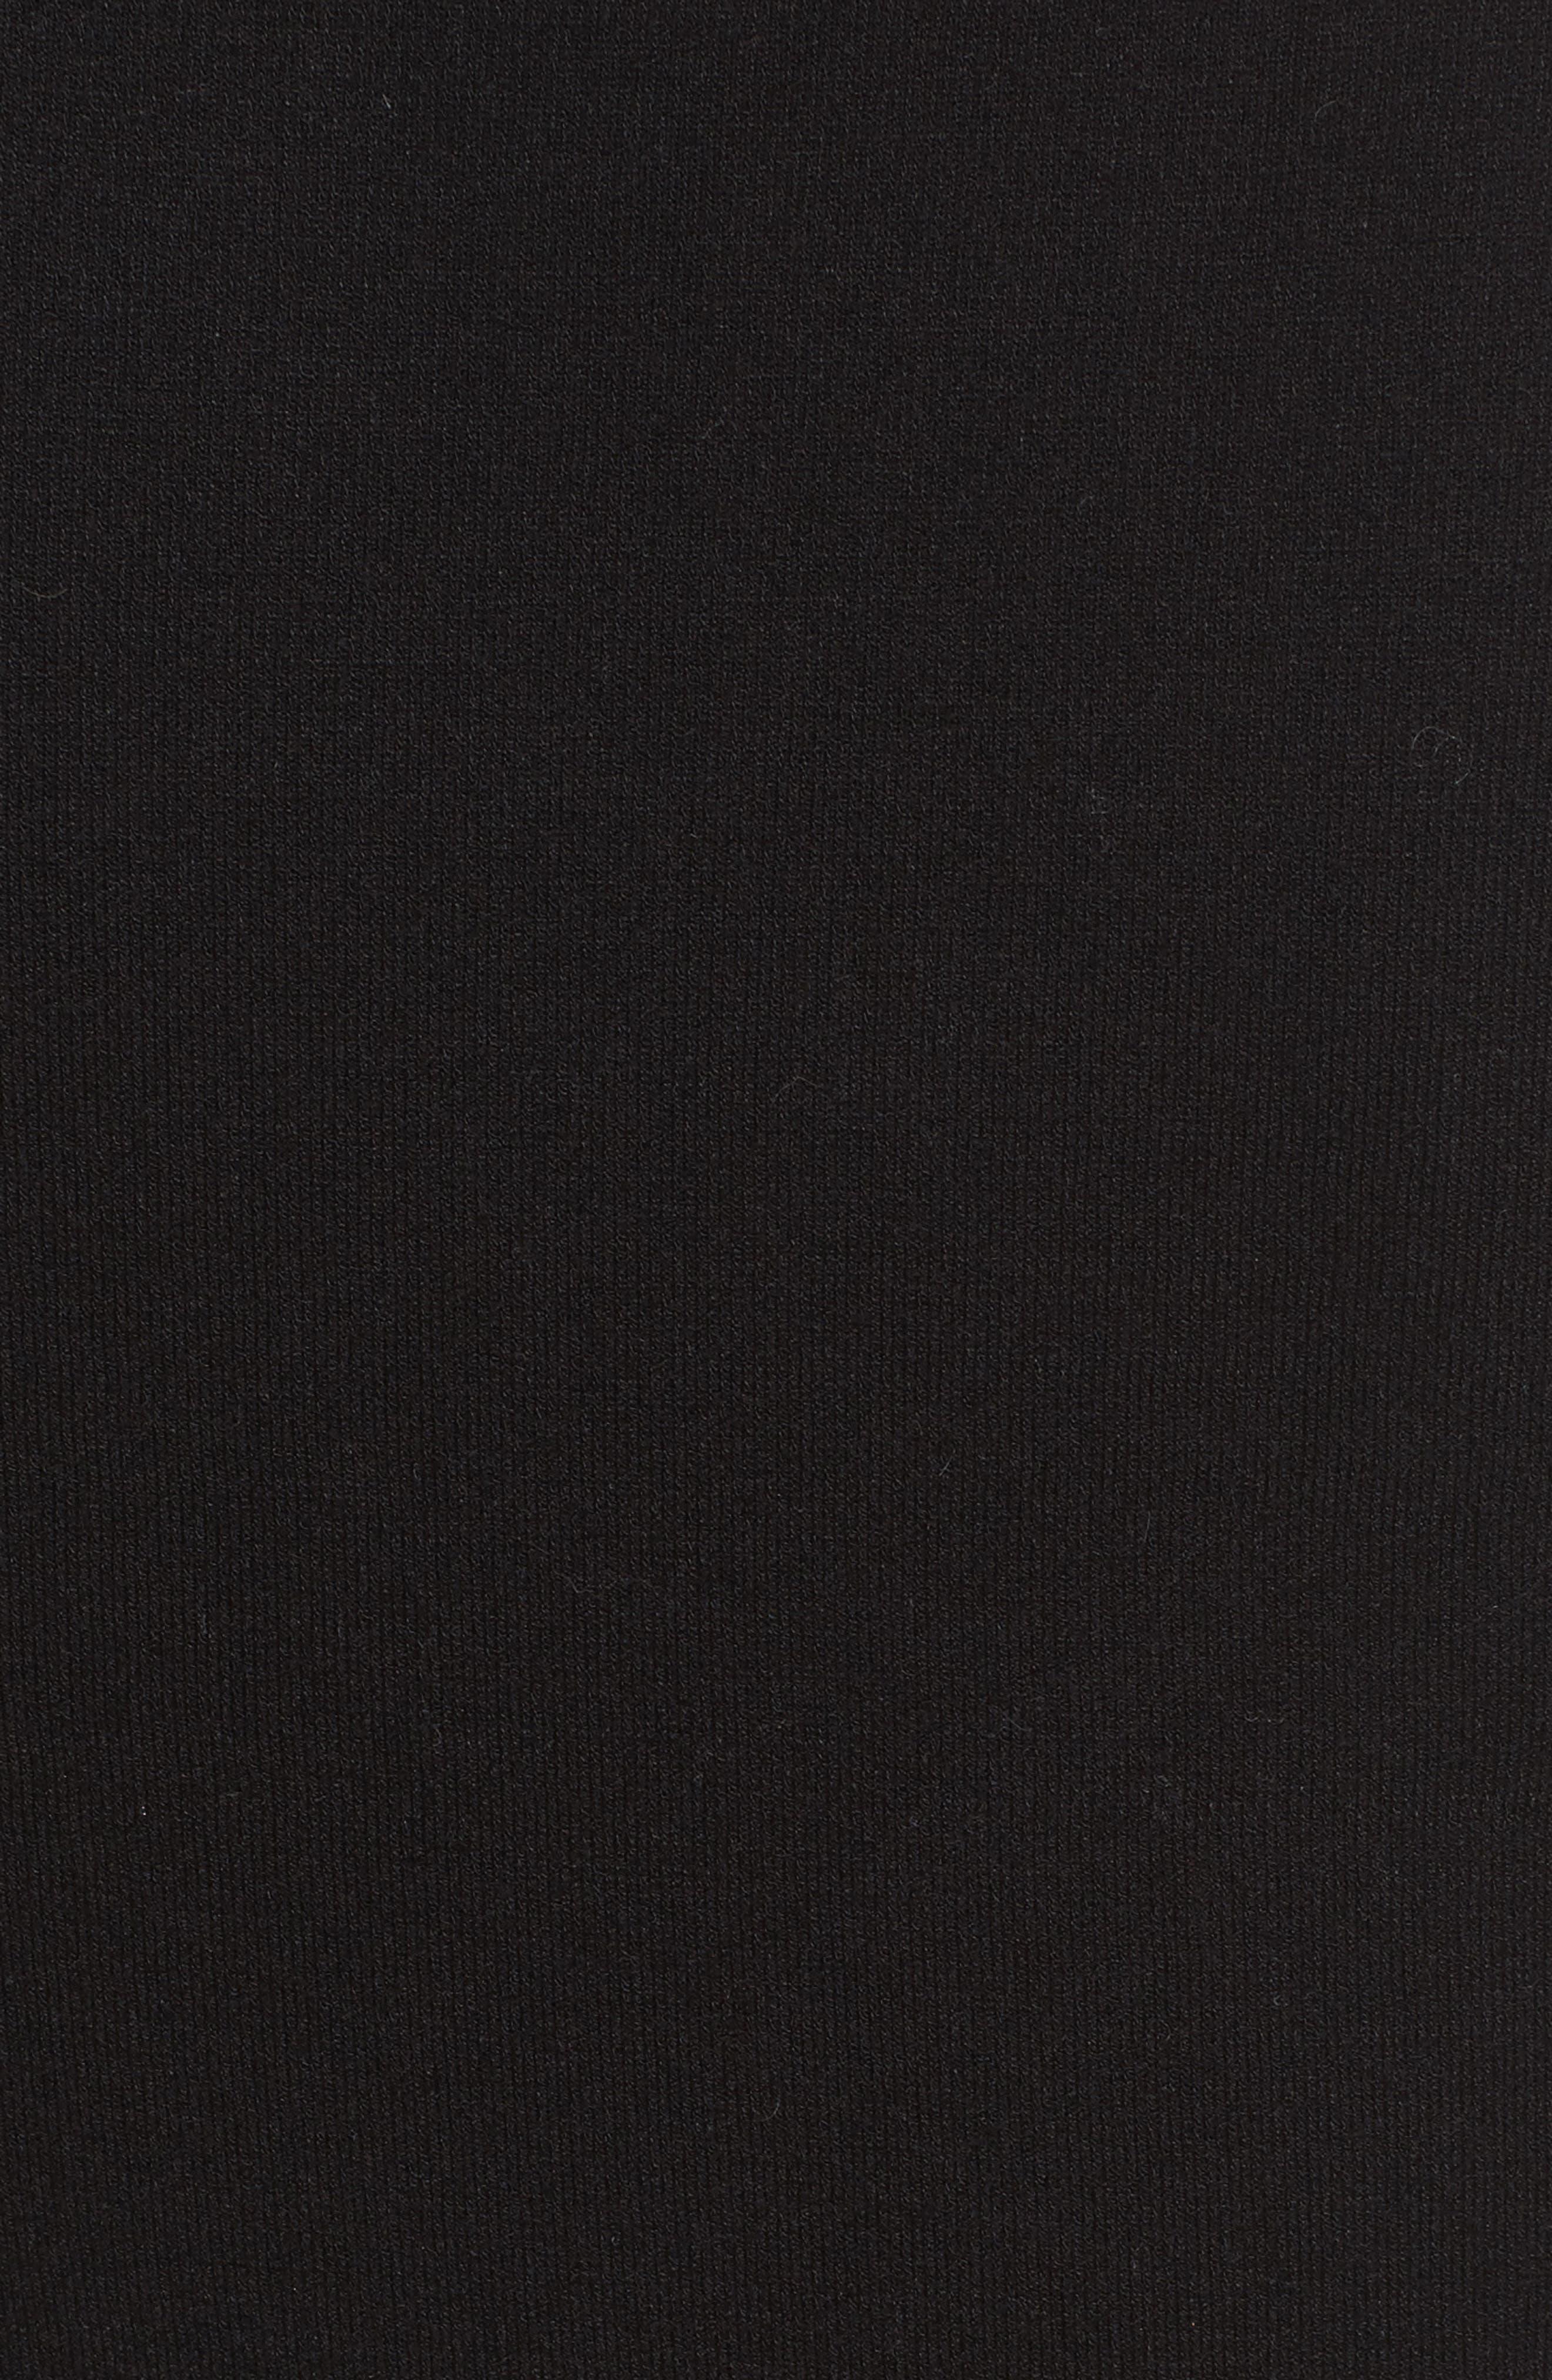 Railey Cutout Dress,                             Alternate thumbnail 5, color,                             001